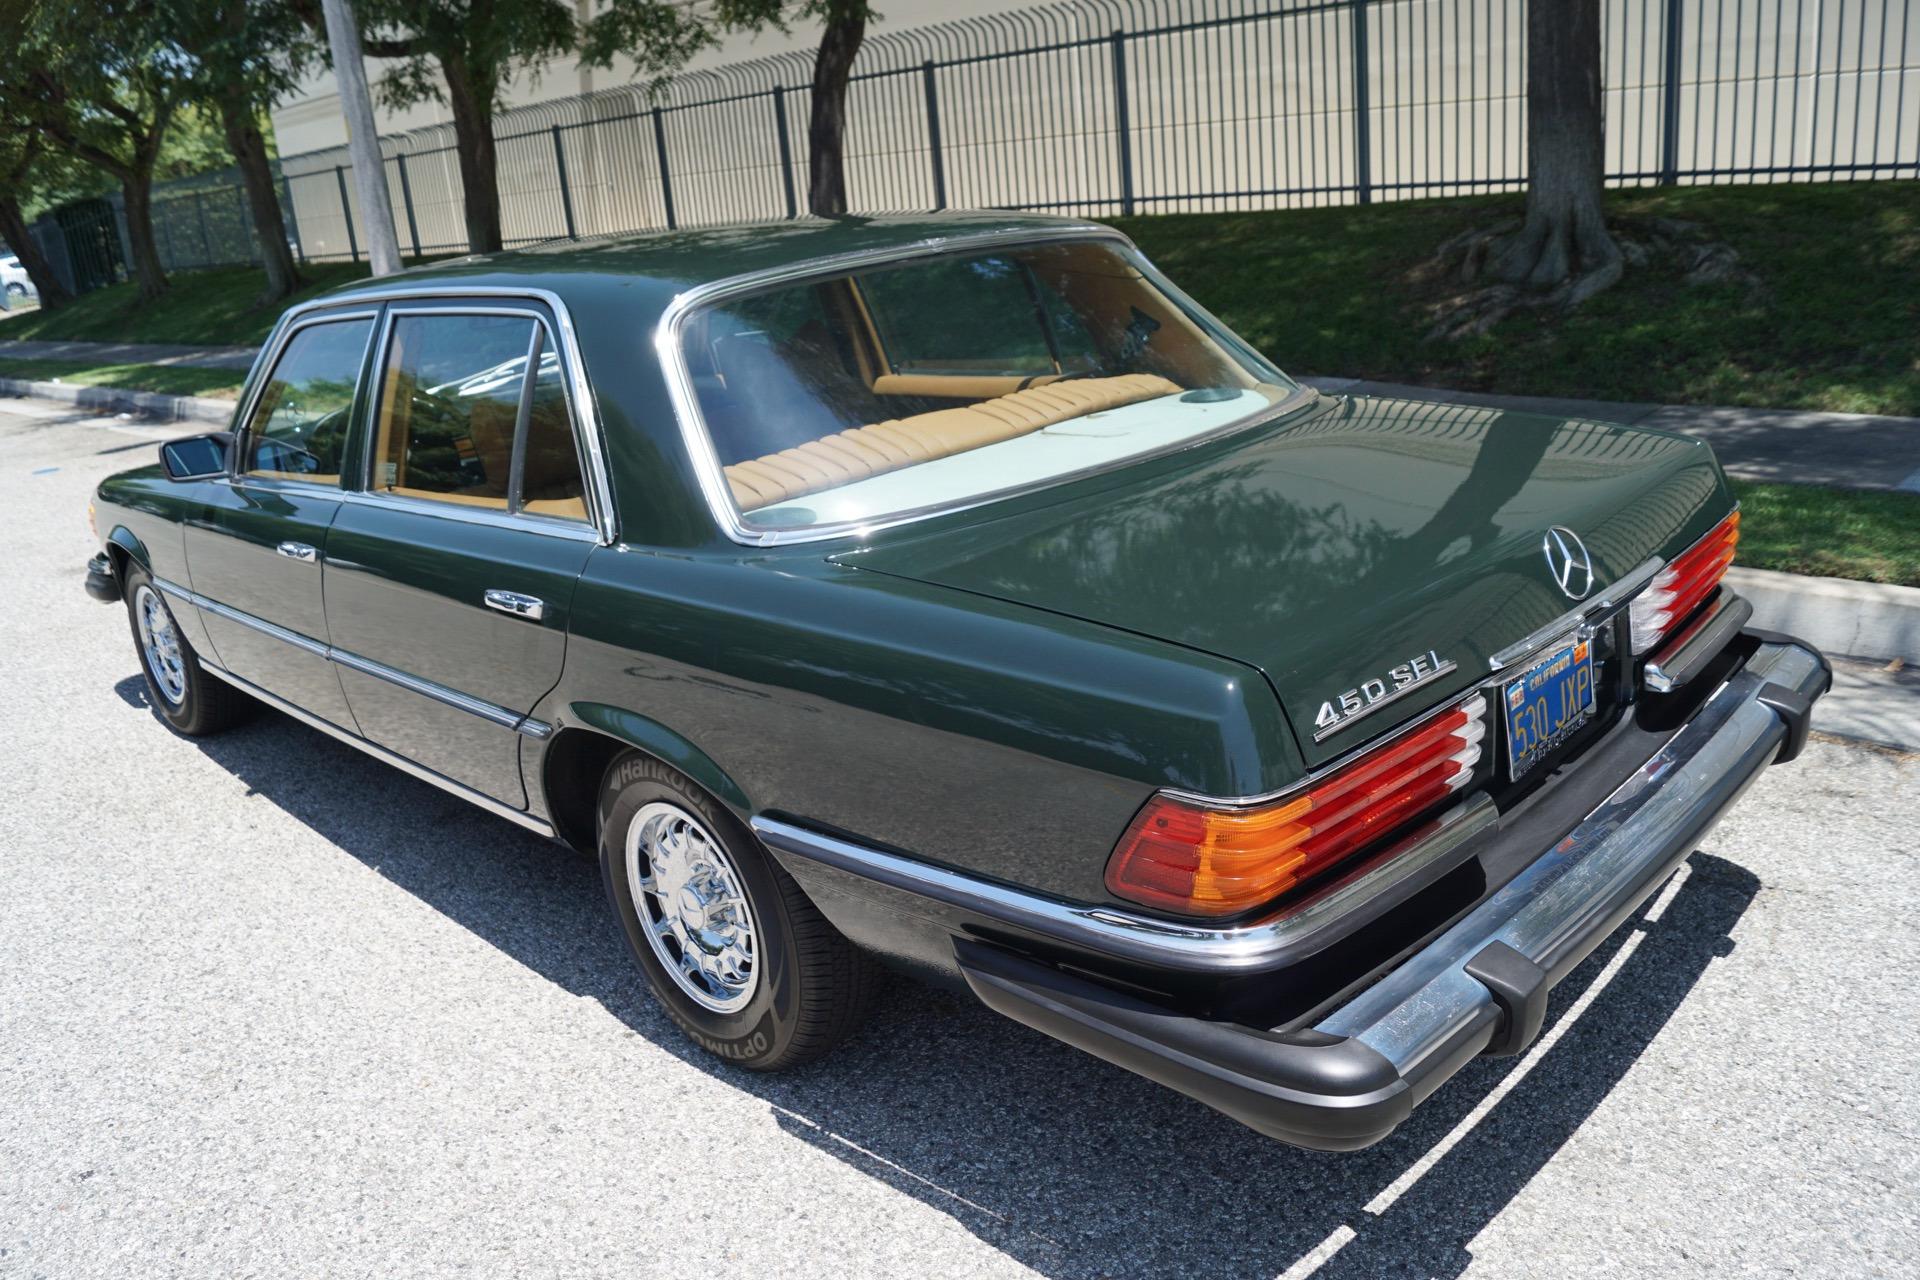 1974 mercedes benz 450sel for sale classic mercedes for Mercedes benz classic cars for sale